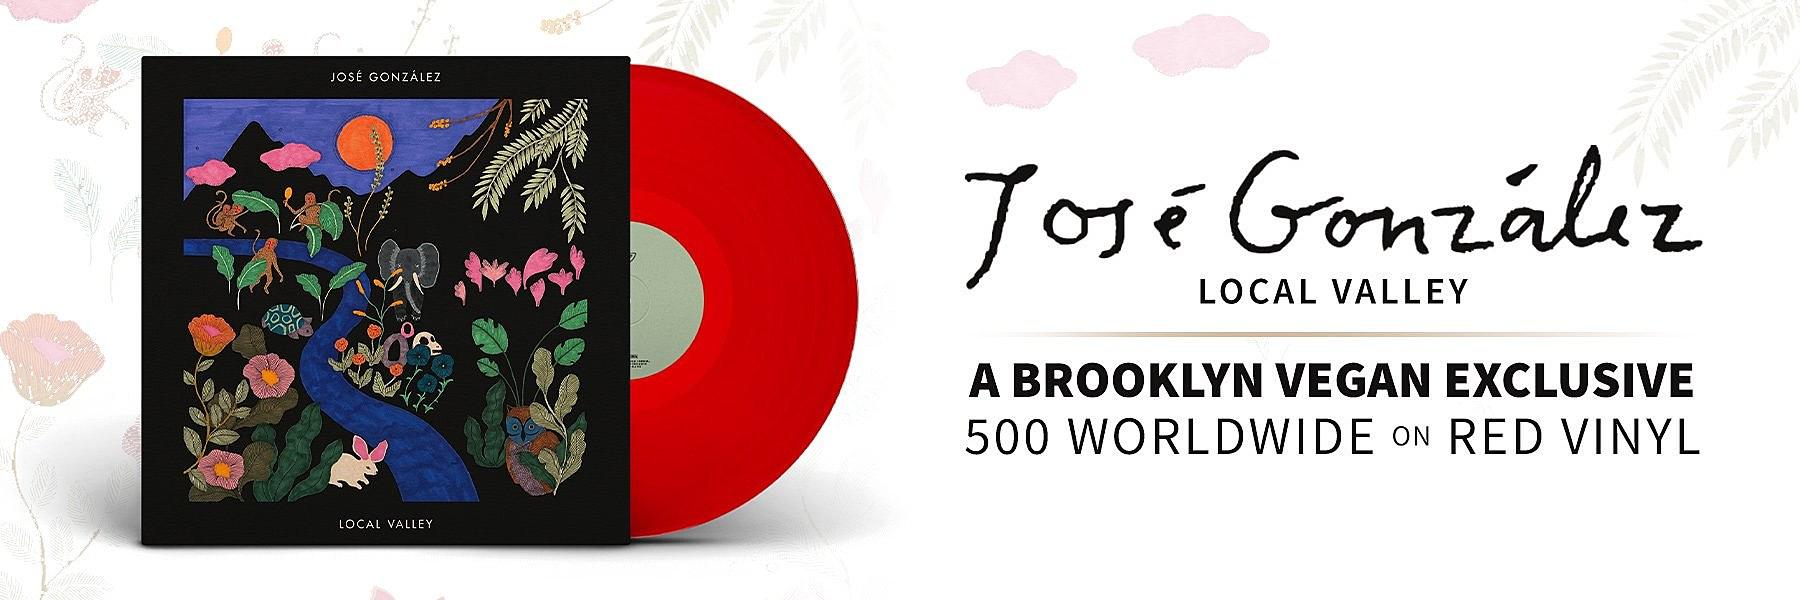 Jose Gonzalez record